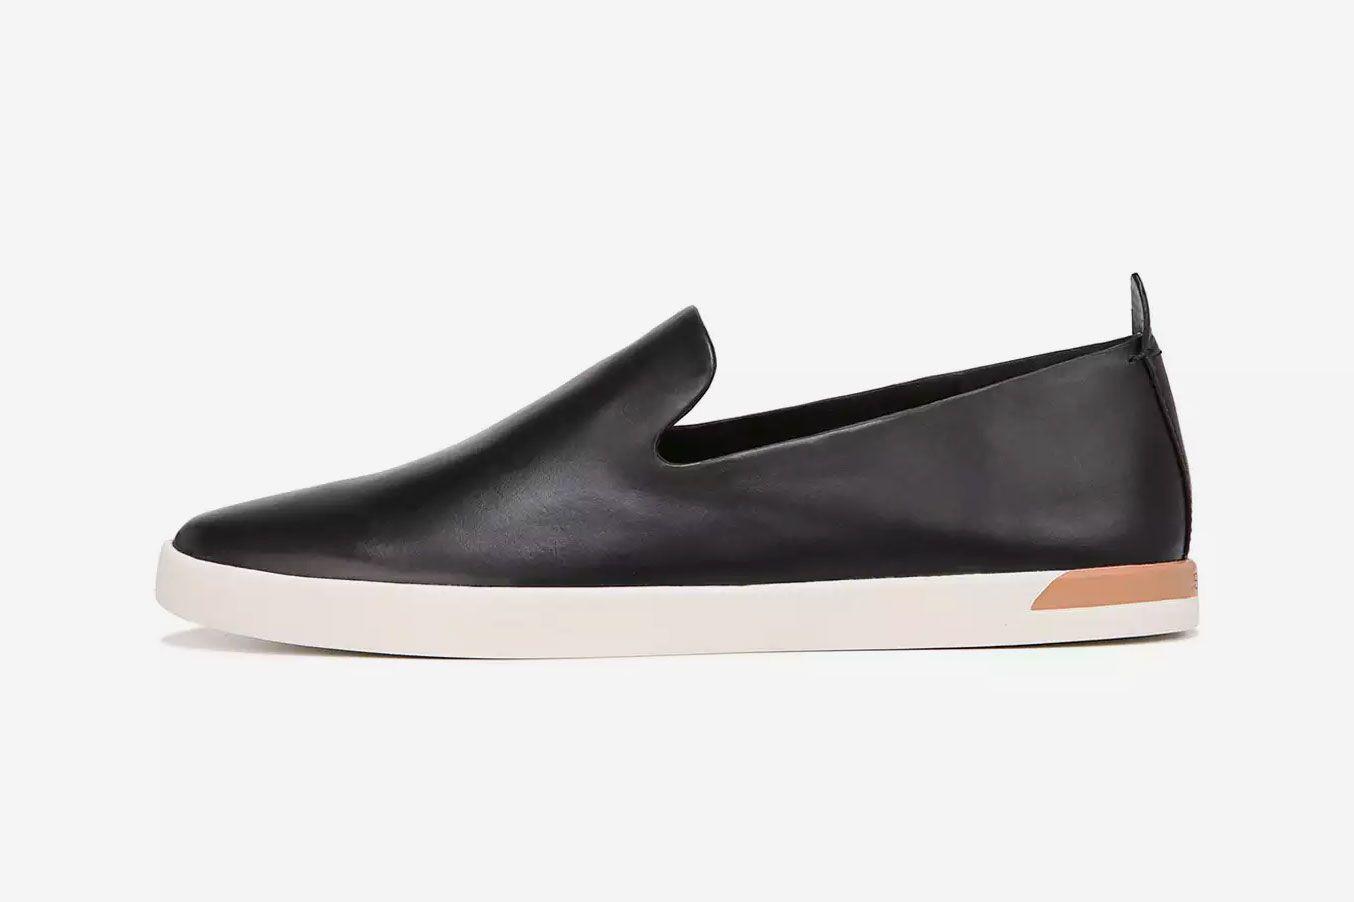 Vince Vero Calf Slip-On Sneakers